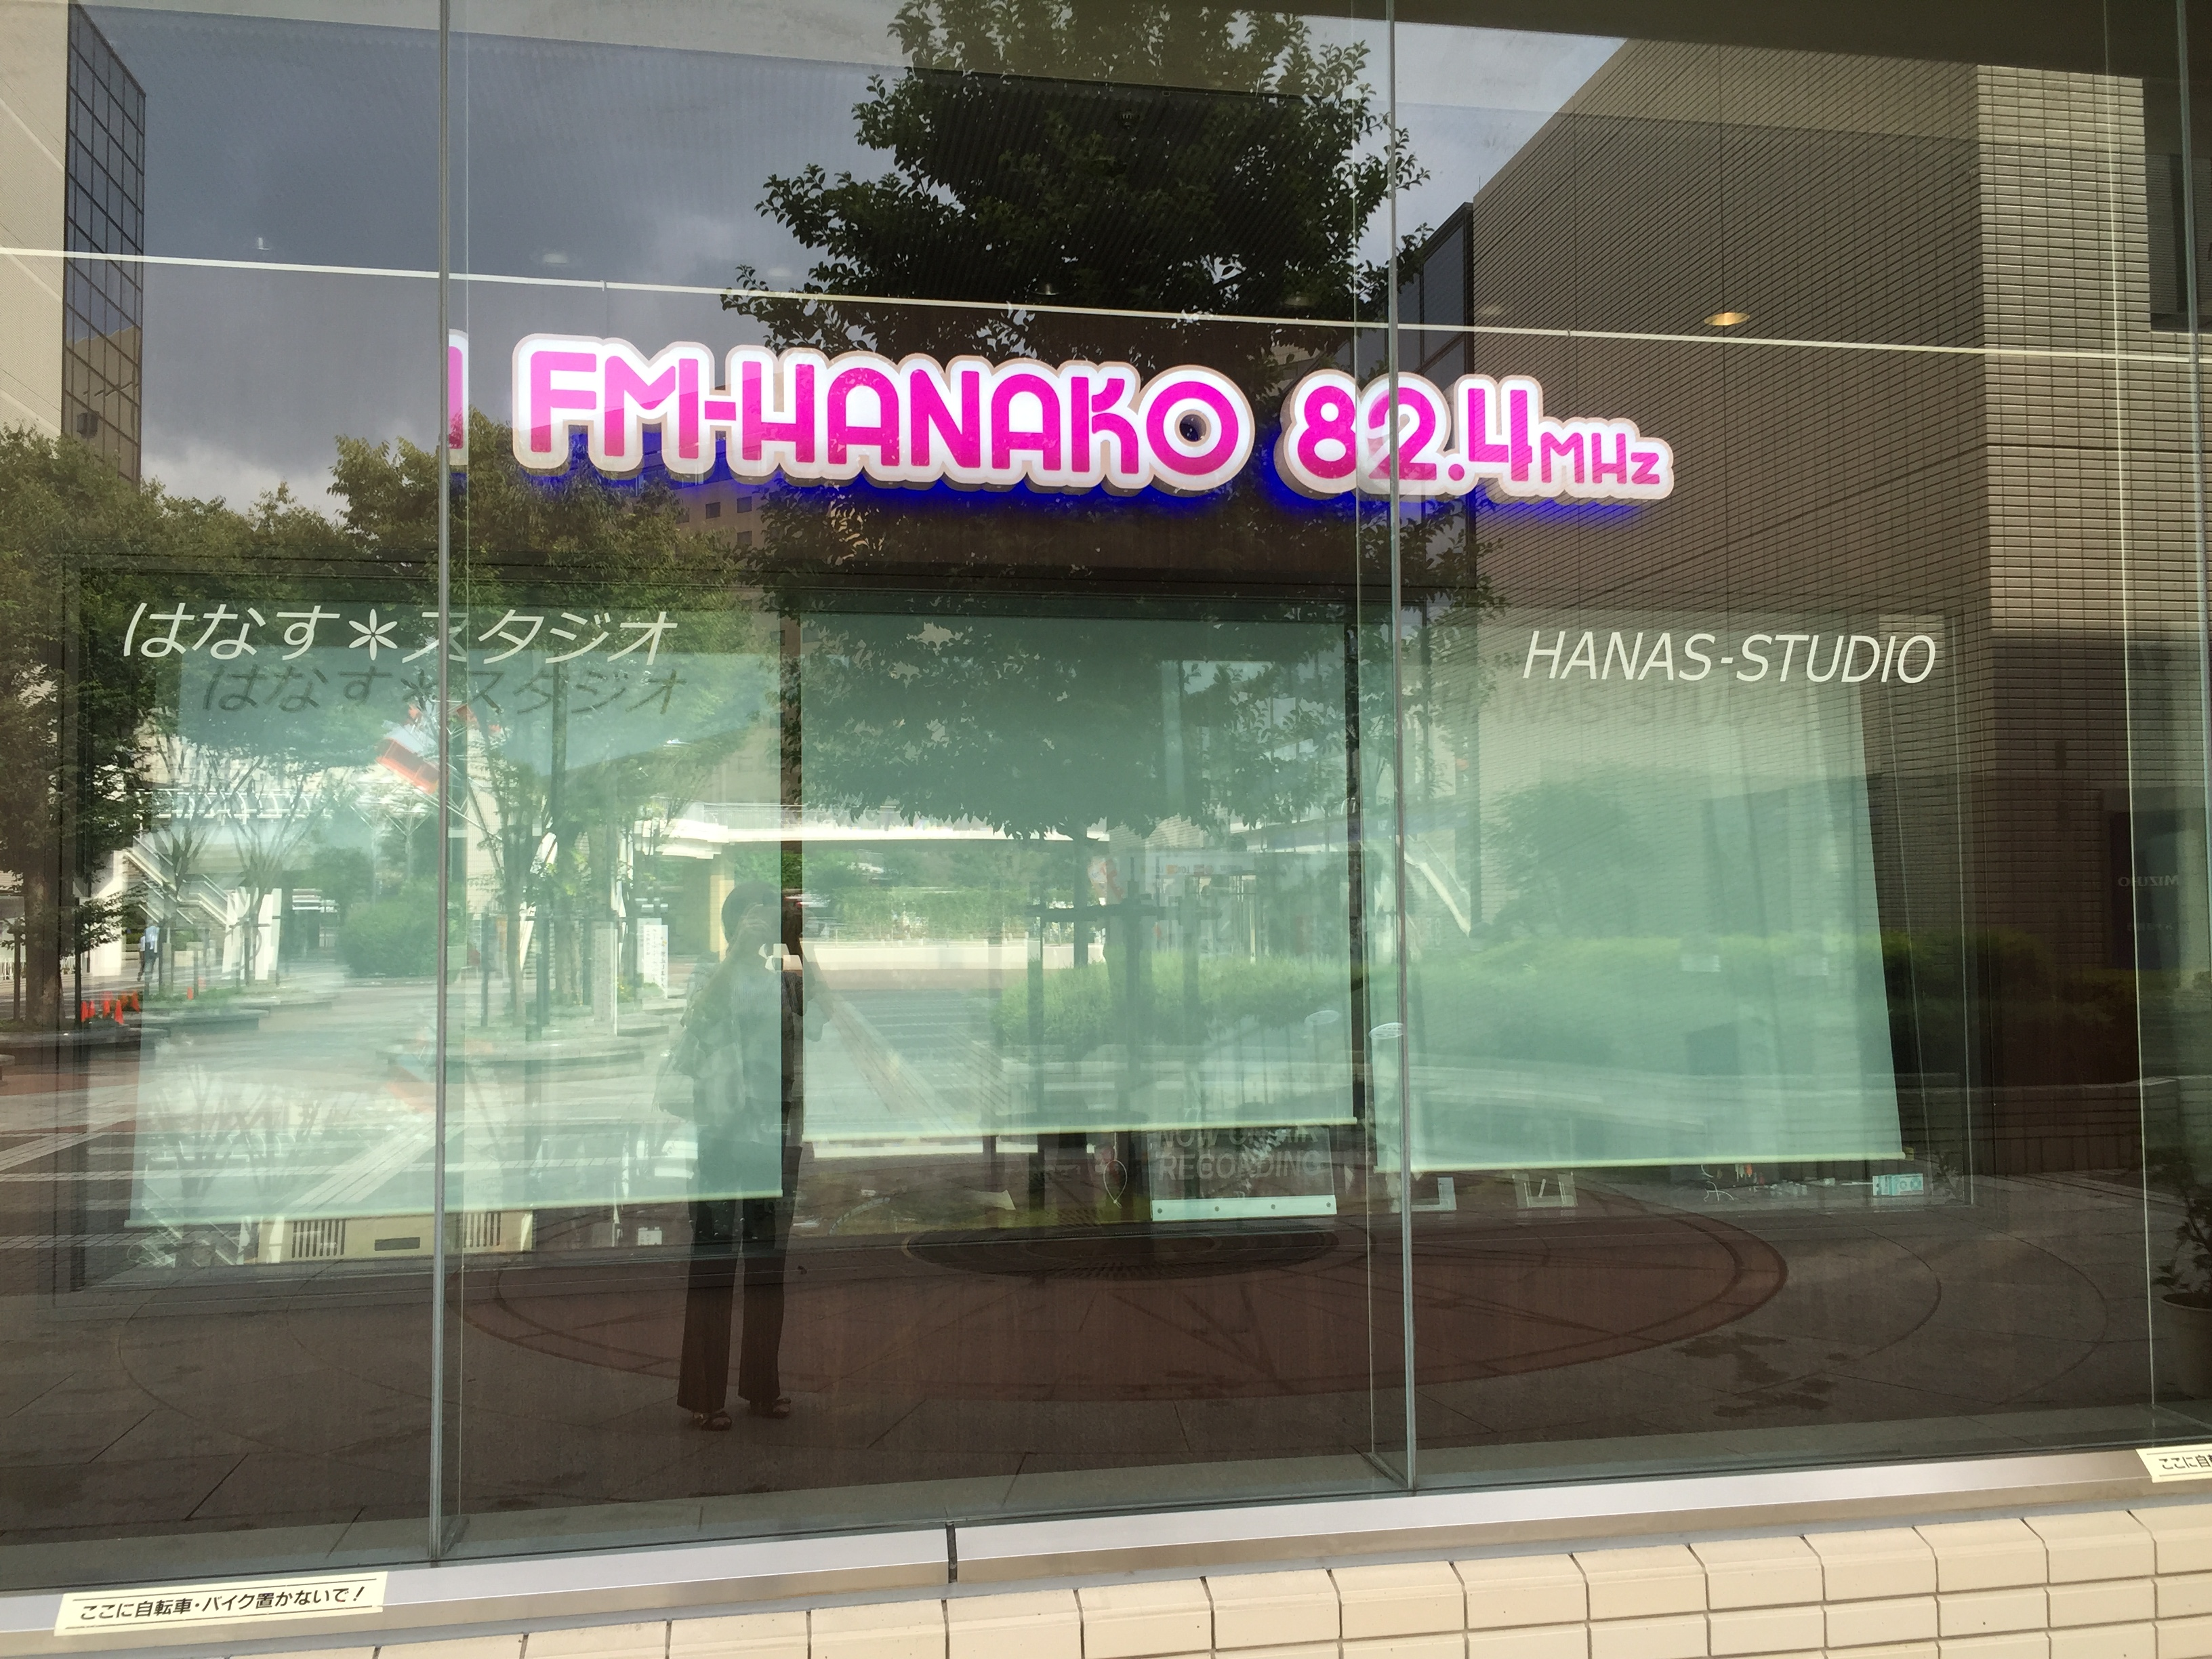 FM-HANAKO生放送終了しました